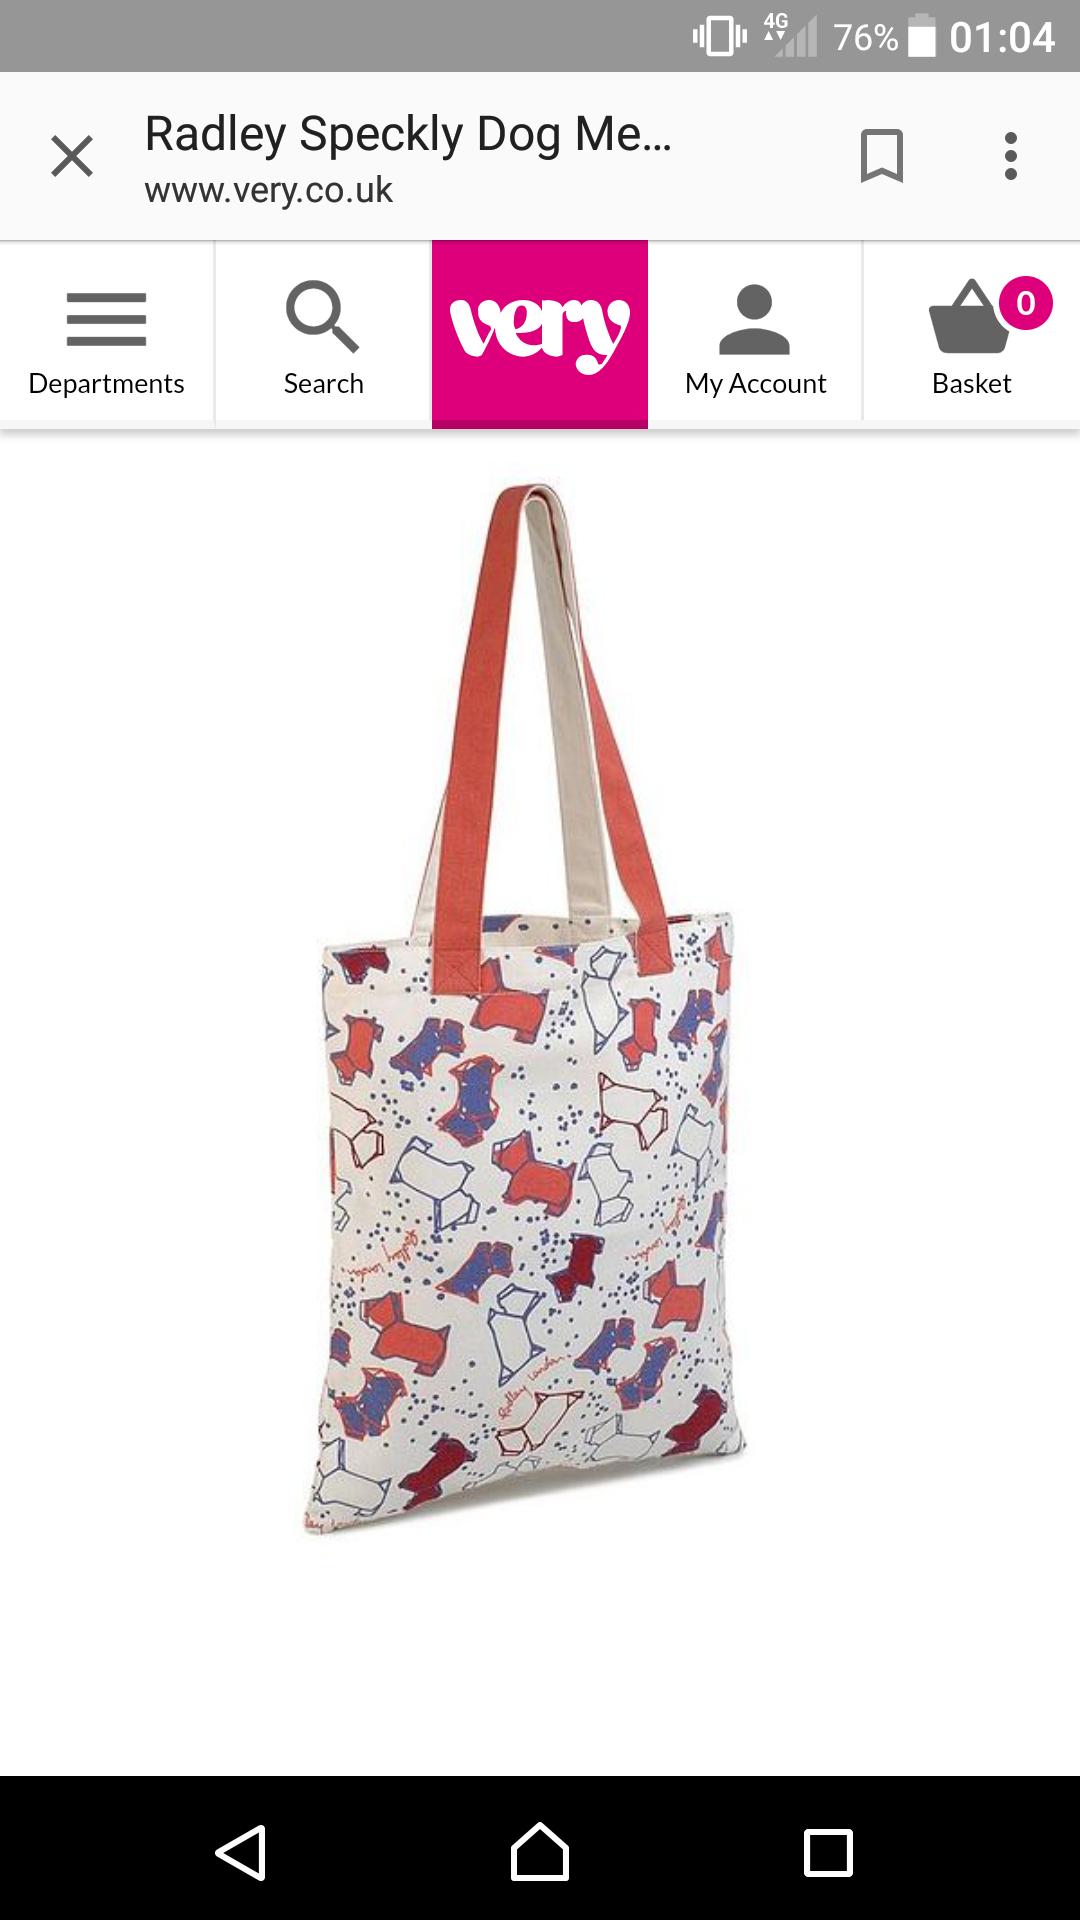 Radley speckley dog medium tote bag @ very - £10